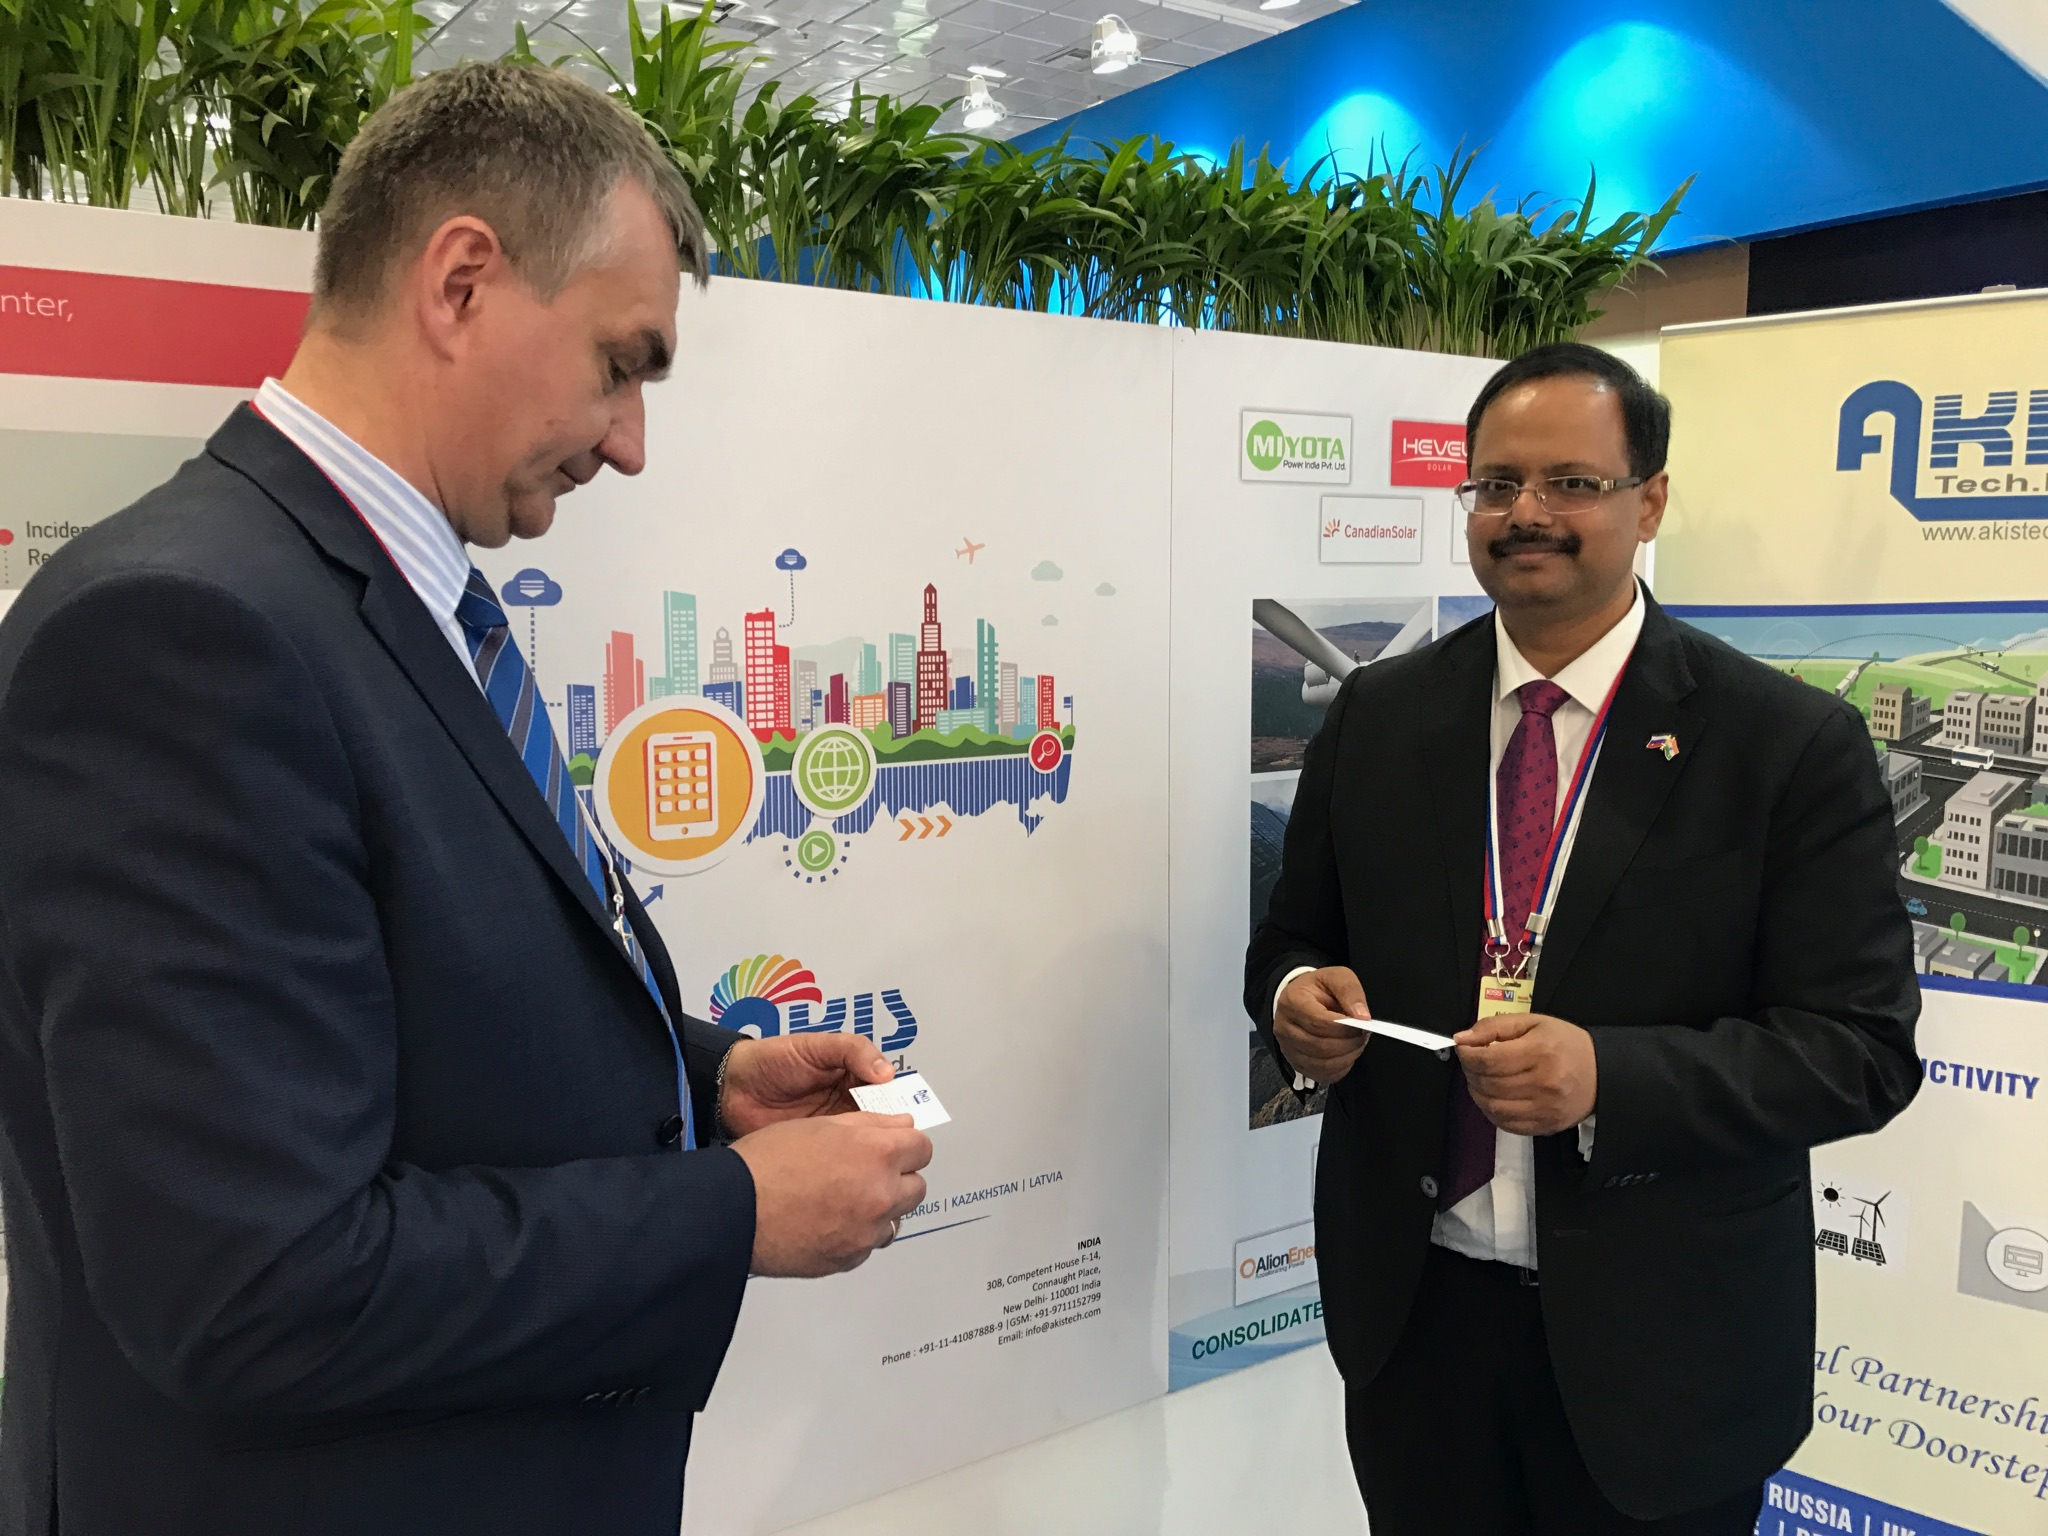 Alok Kumar, President of Myota Power and M.Basheer Ahamed Chairman of Akis Tech Ltd. Source: Ksenia Kondratieva